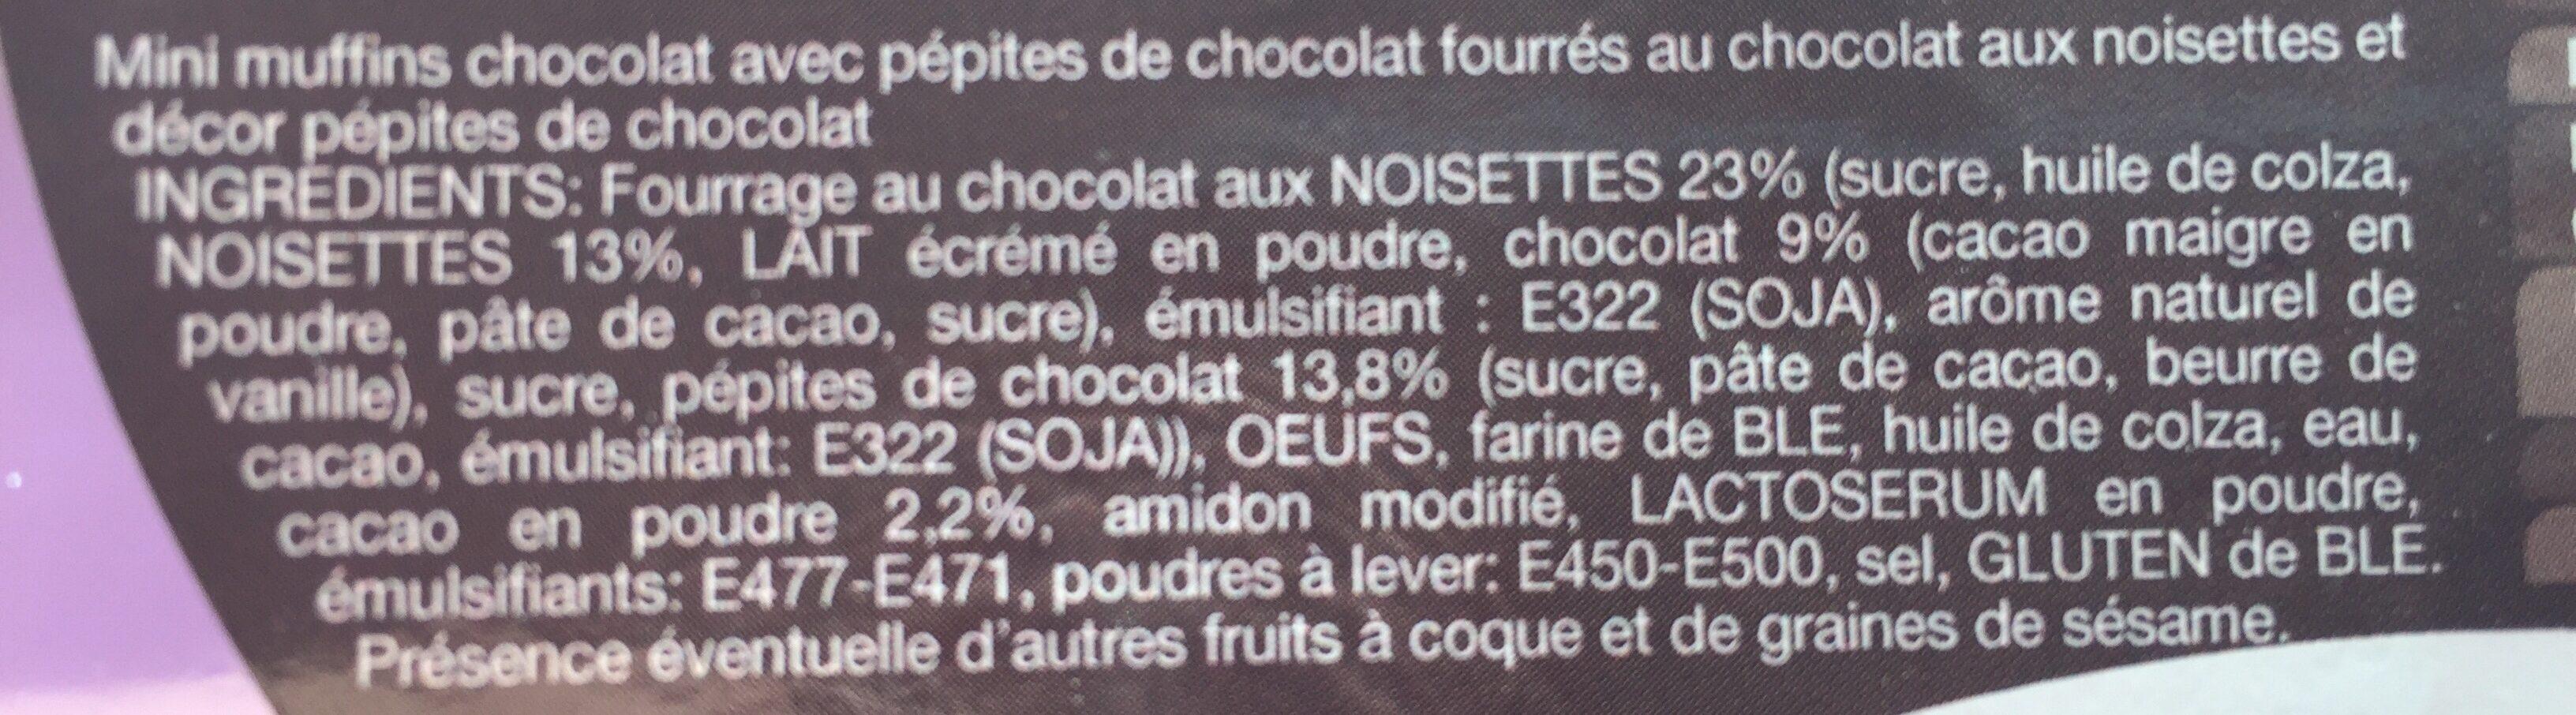 Mini muffins coeur fondant chocolat noisettes - Ingrediënten